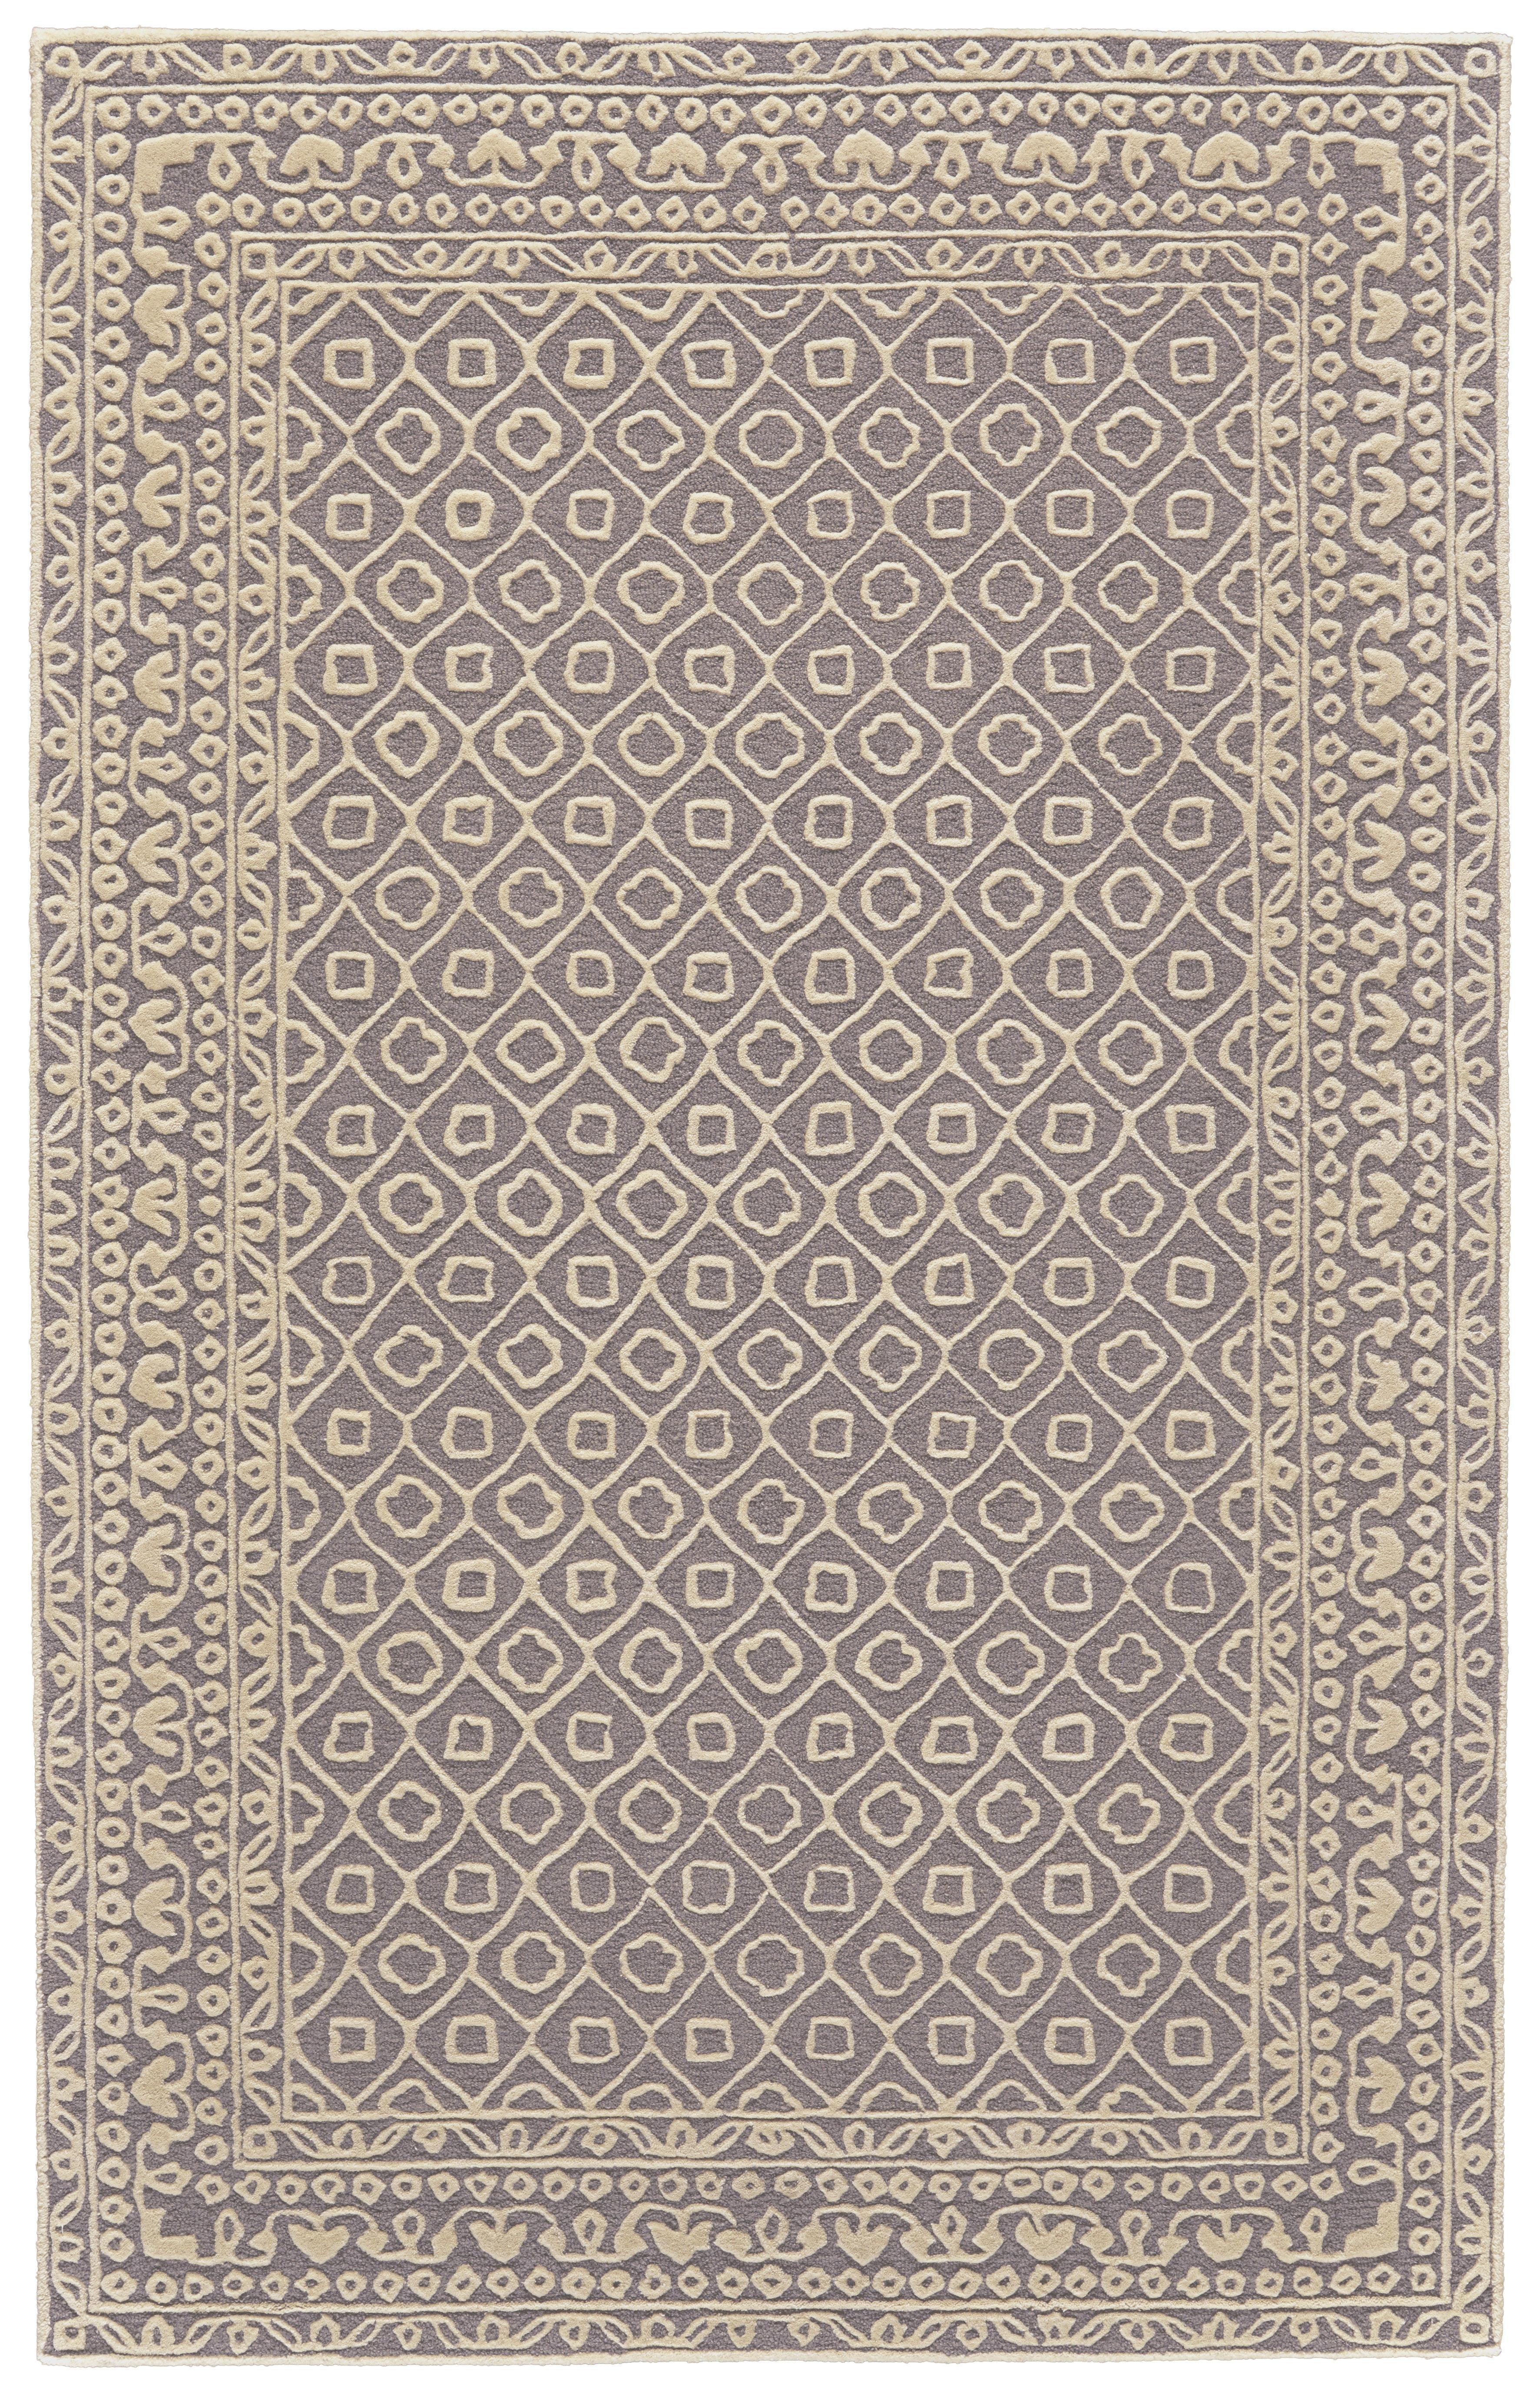 Aultman Southwestern Hand Tufted Wool Dark Gray Ivory Area Rug Reviews Birch Lane